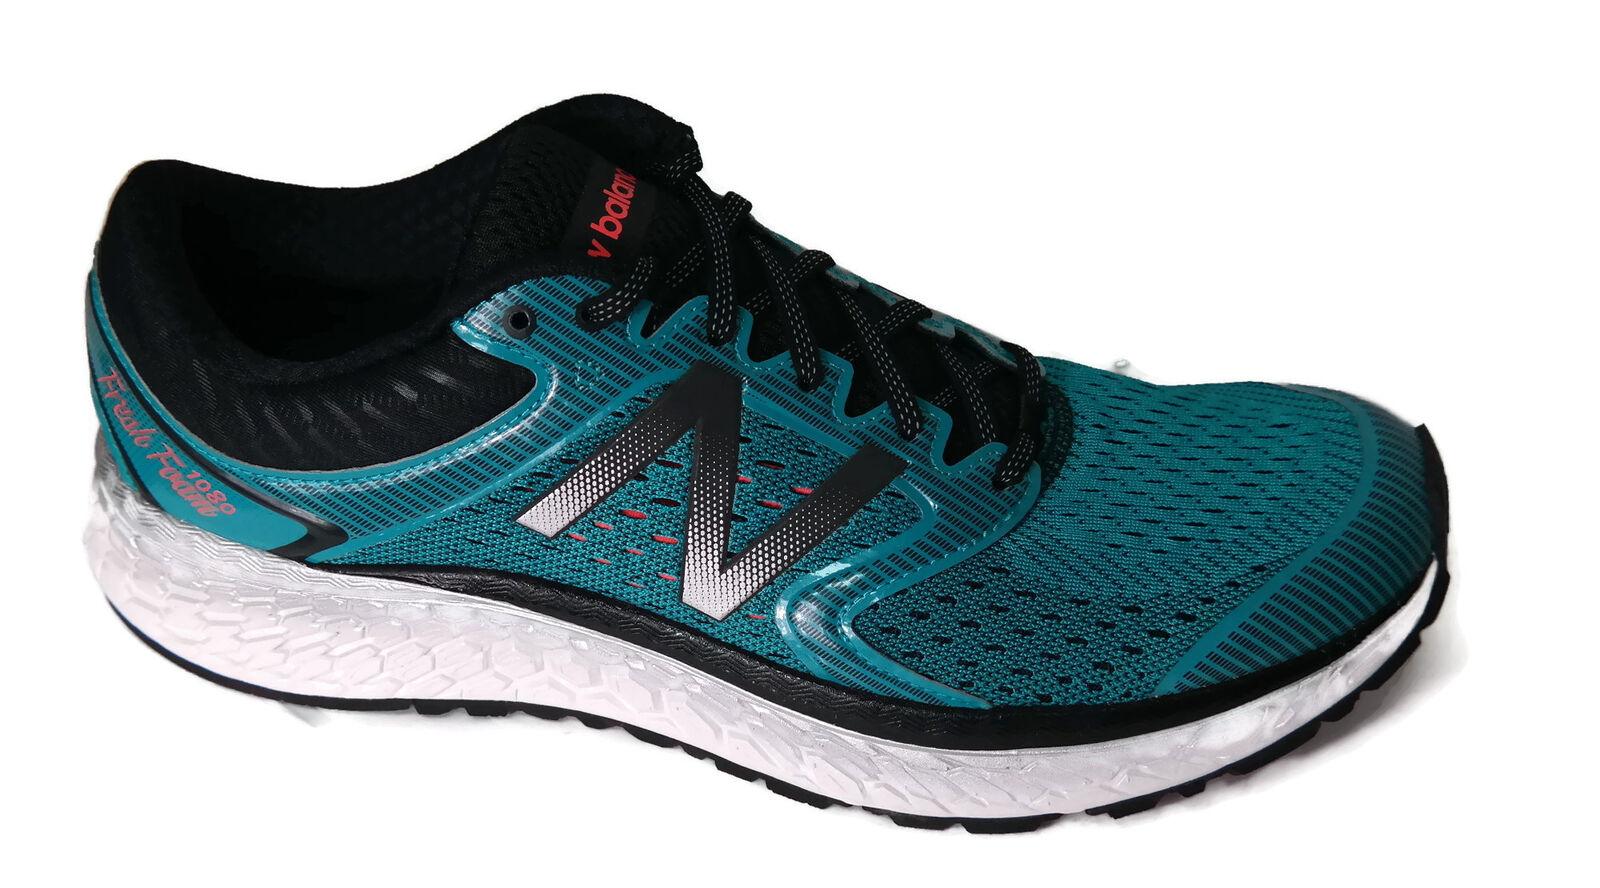 New Balance Men's 1080V7 Running-Shoes, Pisces/Black, 9 D US